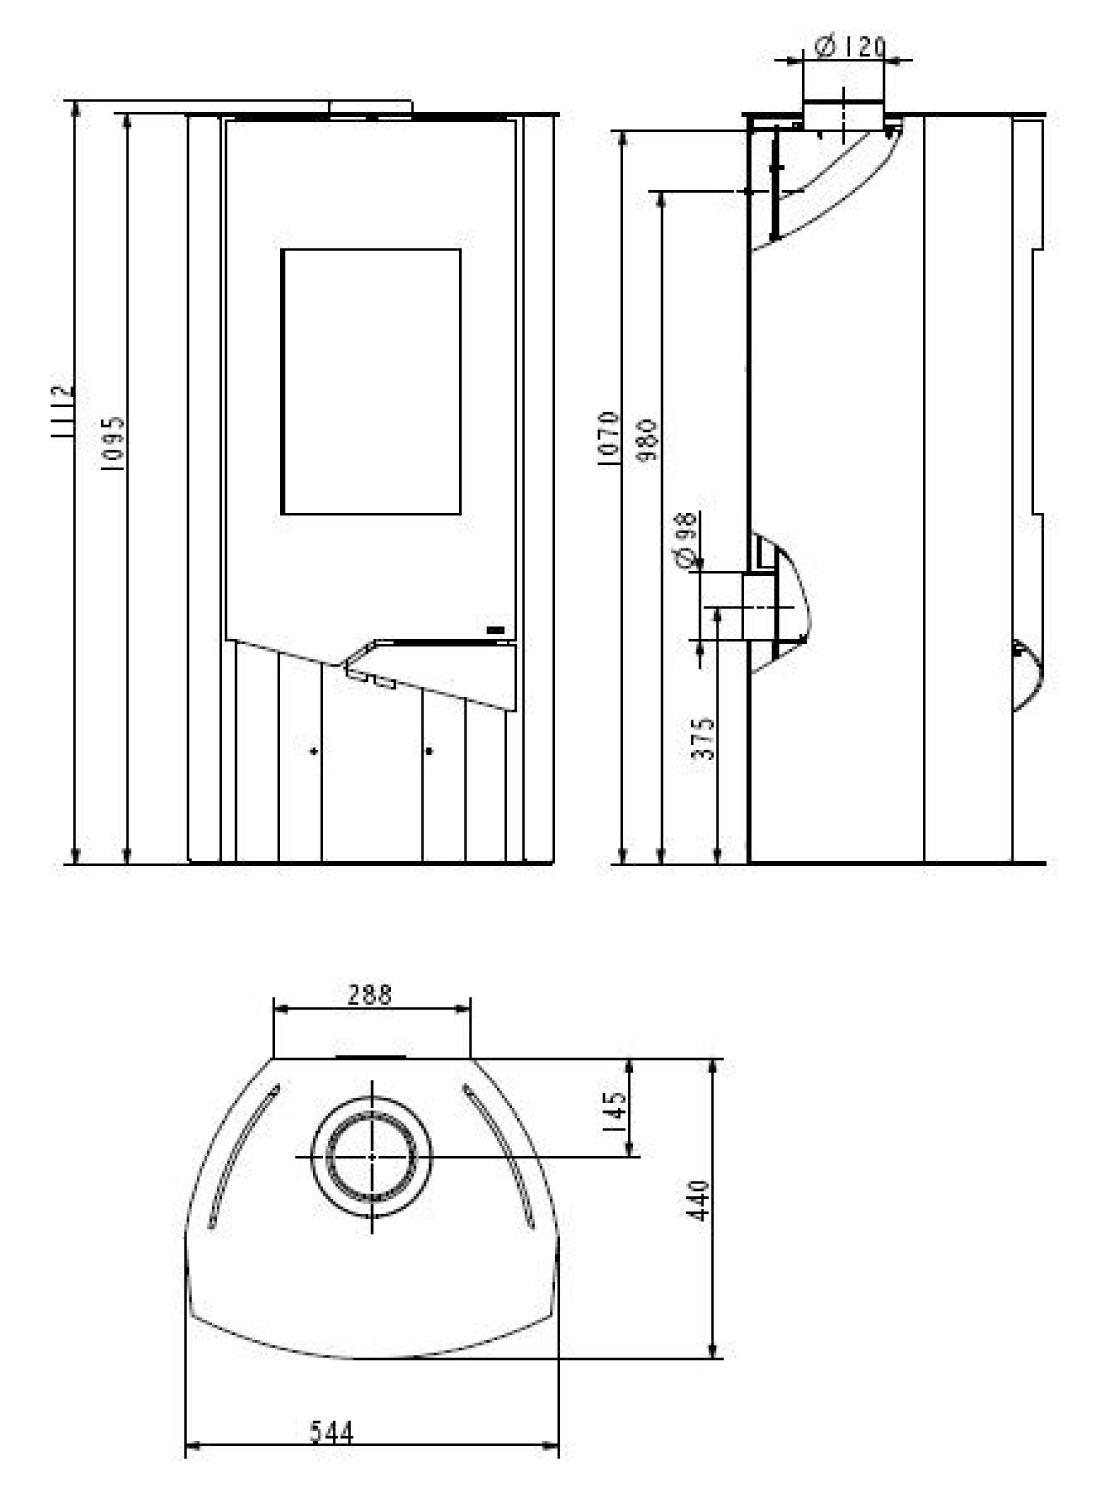 kaminofen wamsler n line naturstein raumluftunabh ngig 5. Black Bedroom Furniture Sets. Home Design Ideas